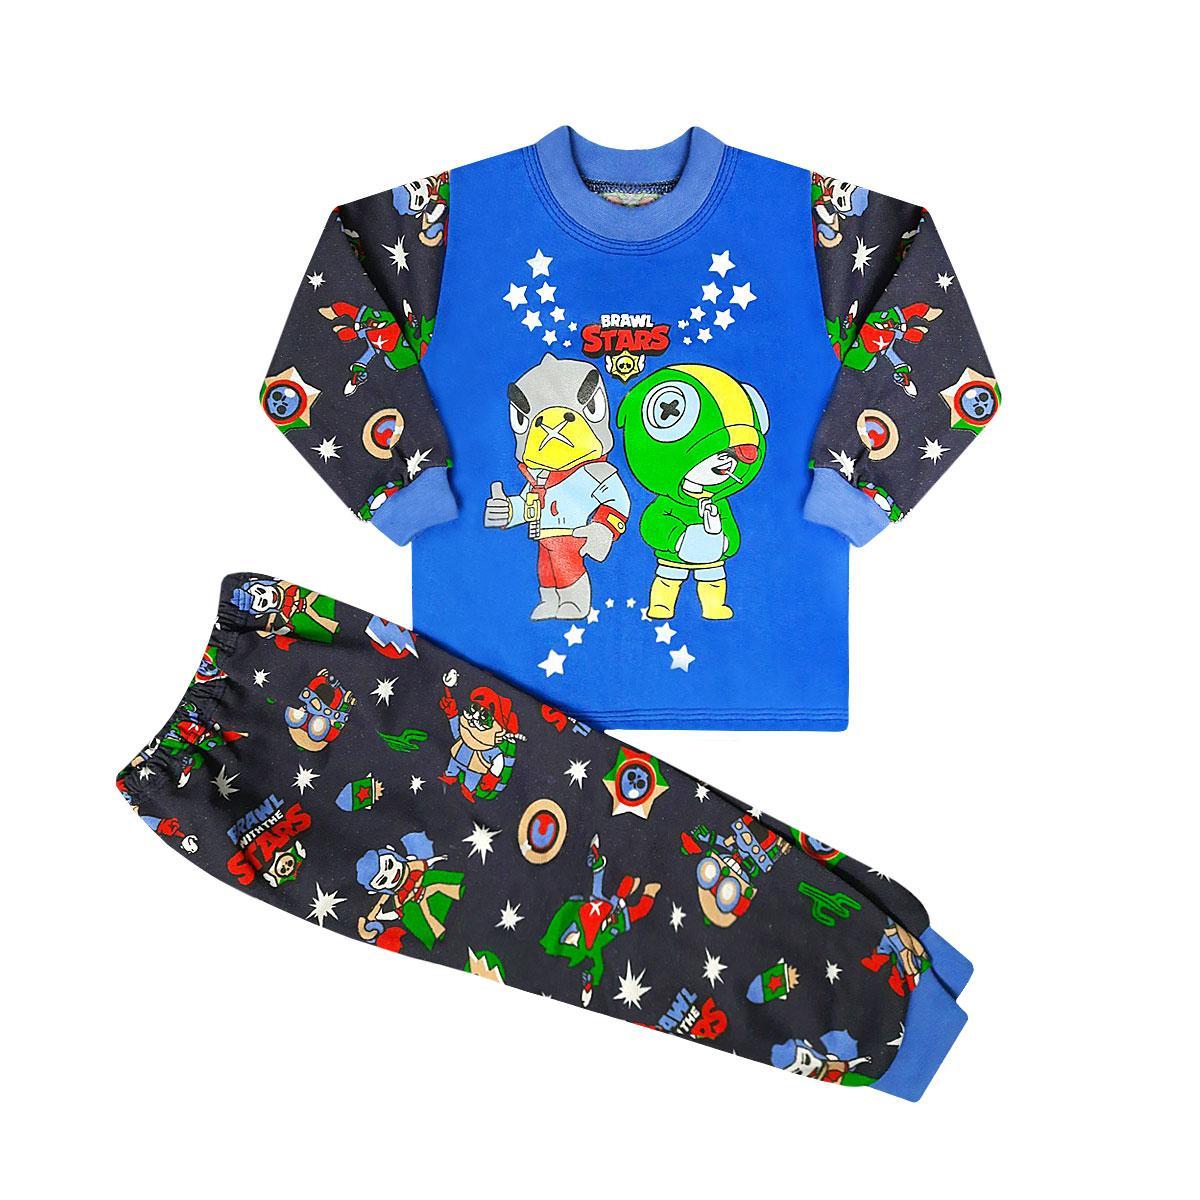 Детская пижама для мальчика Brawl stars начес